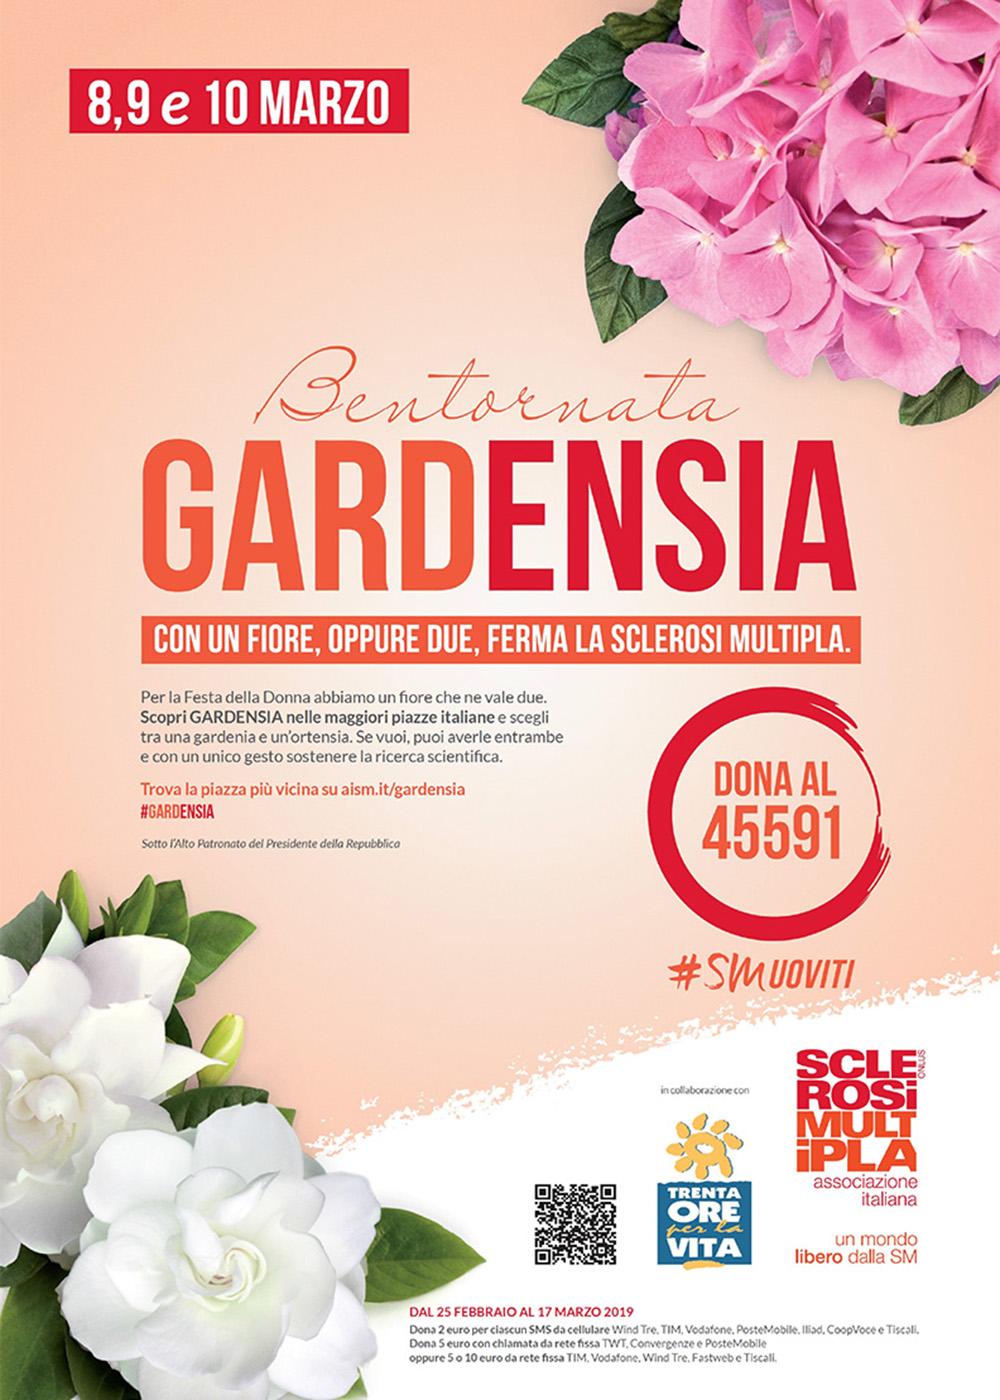 Bentornata Gardensia al Centro Commerciale Extense - 8, 9 e 10 marzo 2019